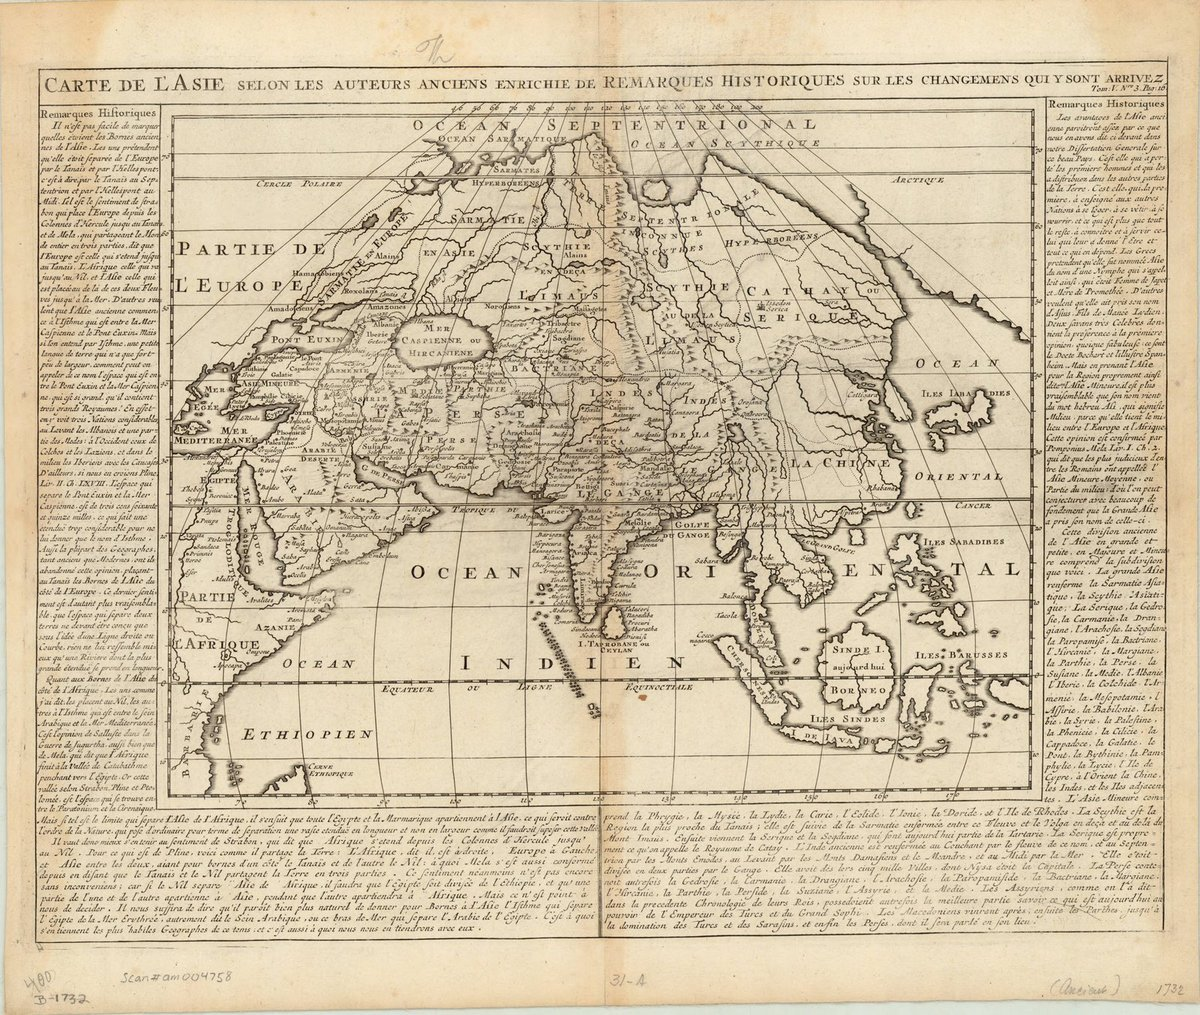 Amazoncom Historic Map Asia 1732 Carte De Lasie Selon